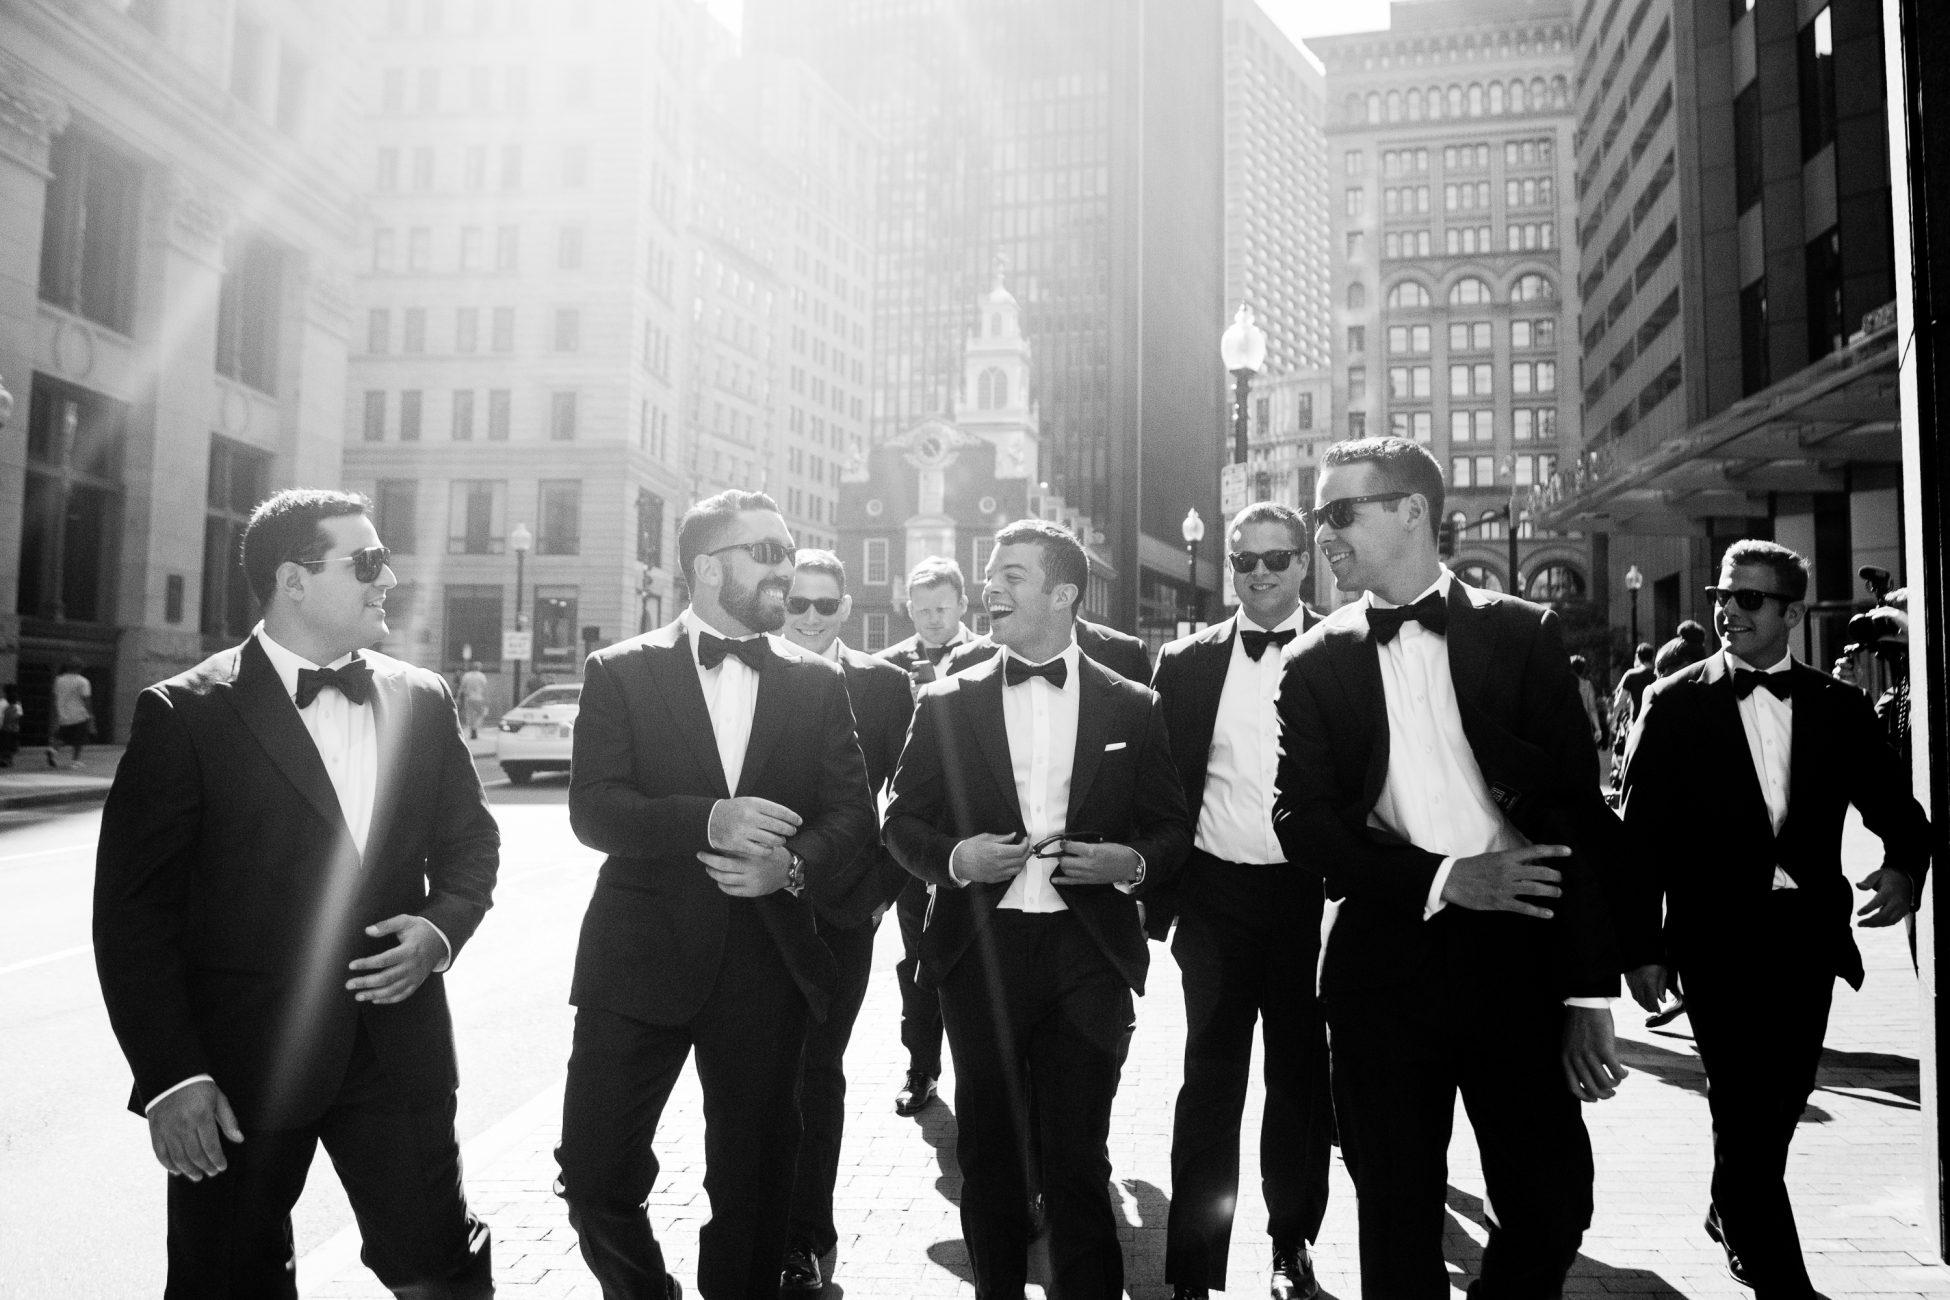 groom and groomsmen walk to a state room wedding